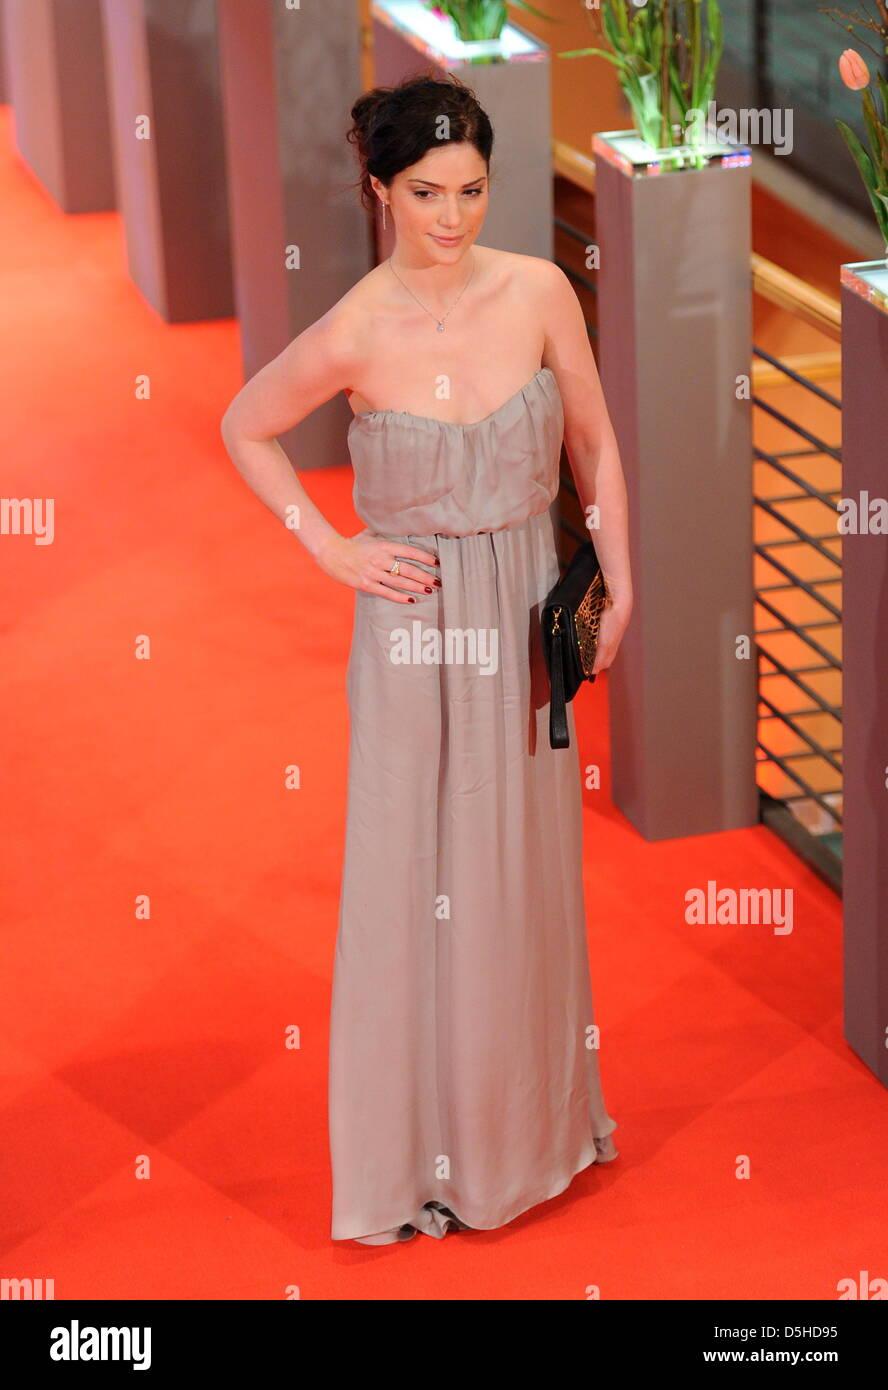 Ambyr Childers,Astrid Allwyn Porno pics & movies Peter Outerbridge,Kristen Dalton (actress)